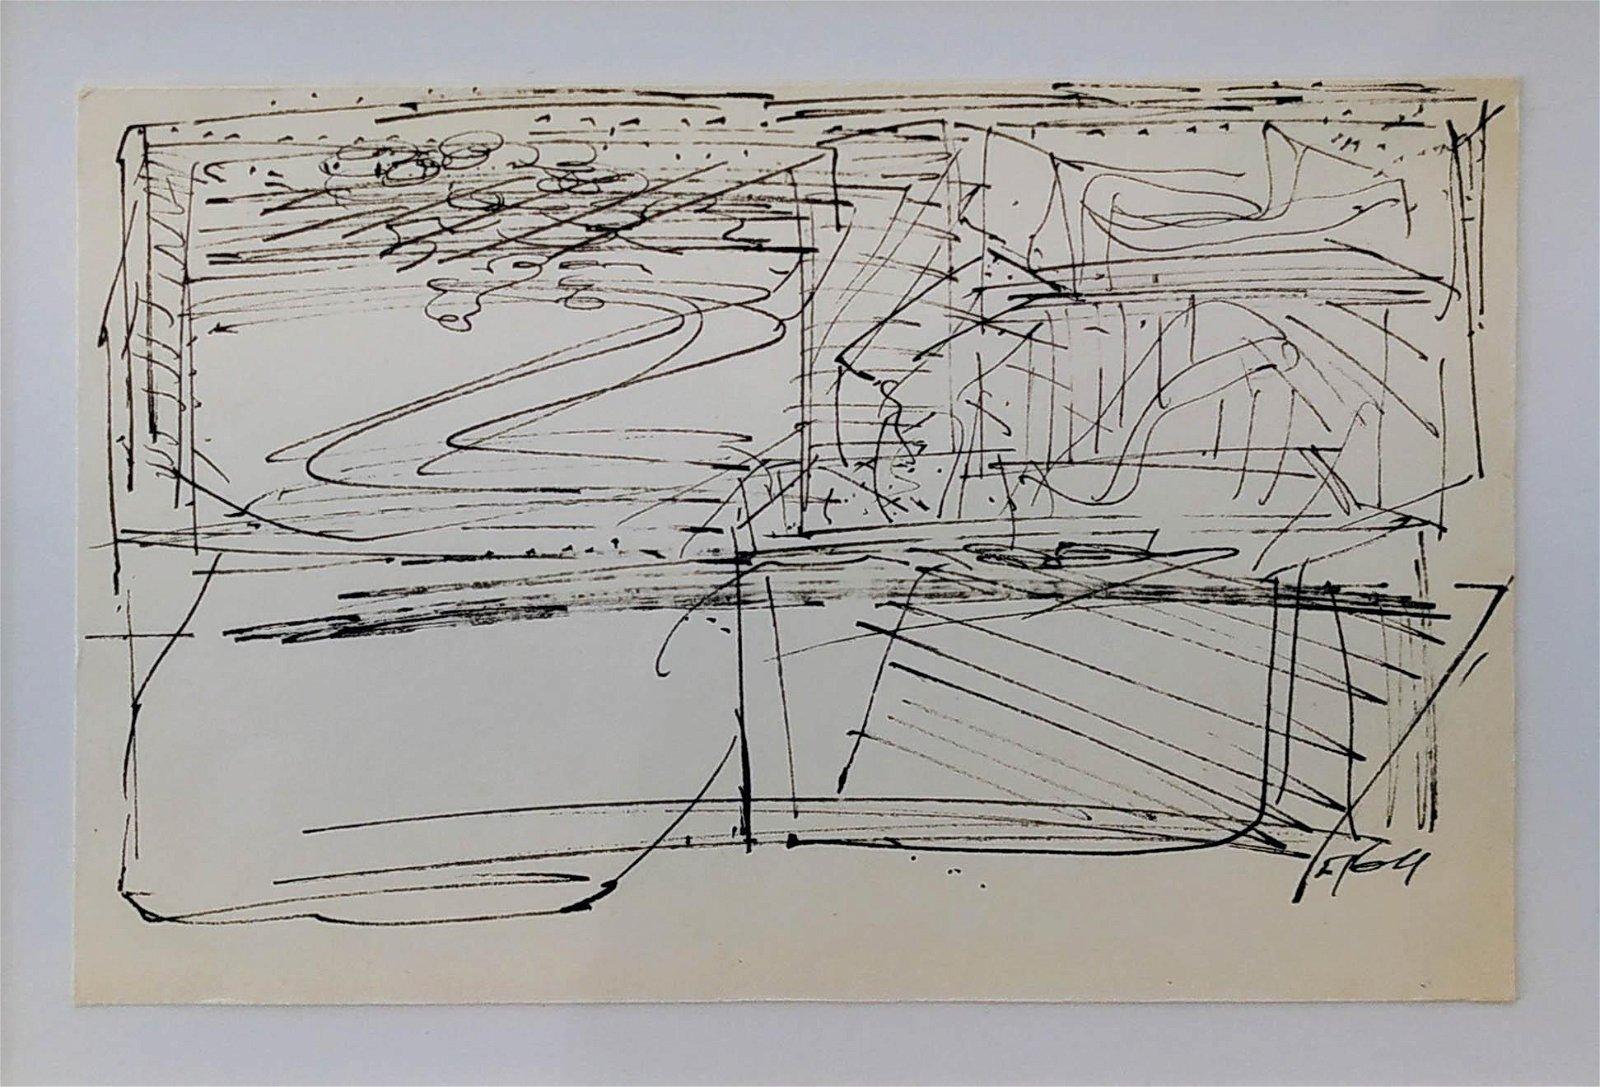 Moshe Kupferman 1926-2003 (Israeli) Untitled, 1964 ink